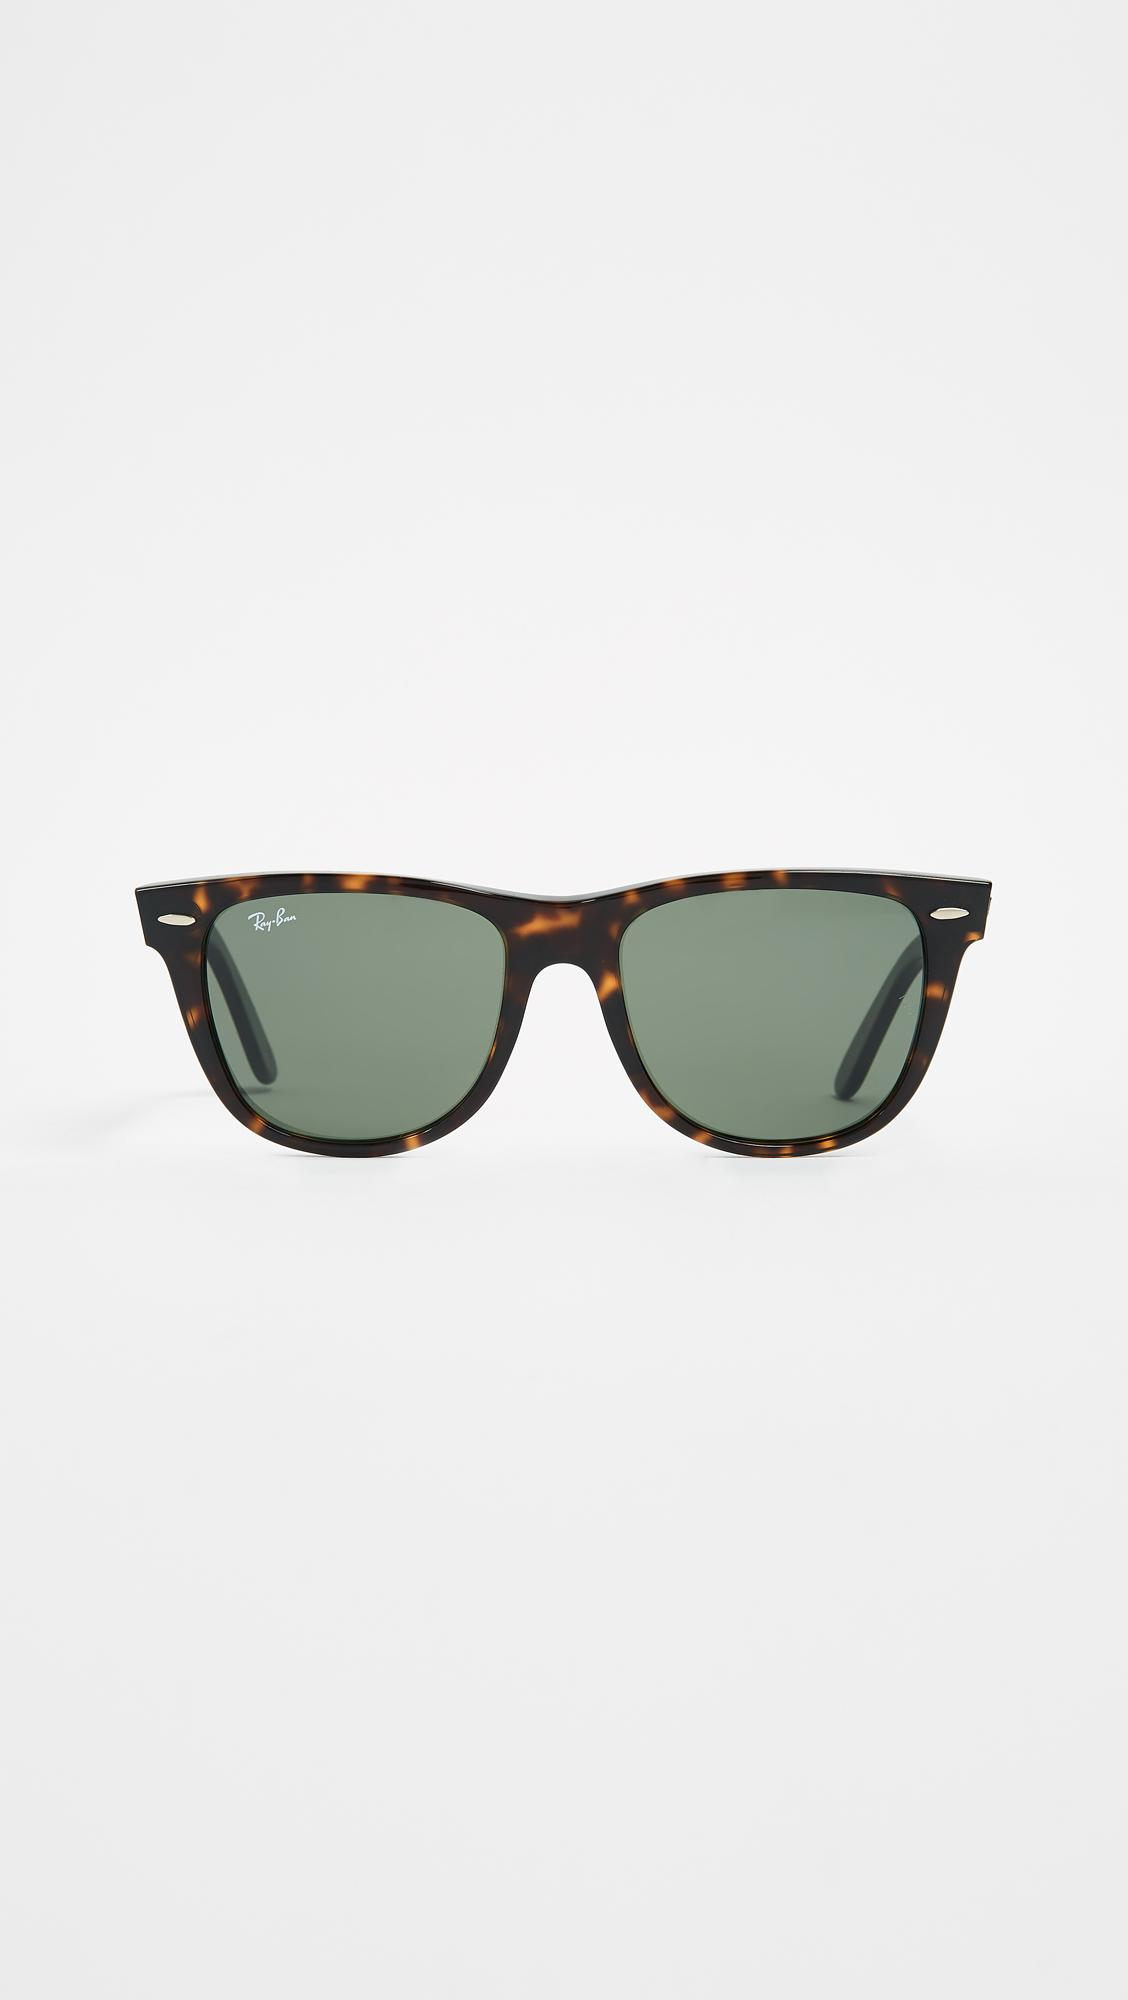 1f410b9ec9fb7 Ray-Ban Rb2140 Wayfarer Outsiders Oversized Sunglasses in Green - Lyst